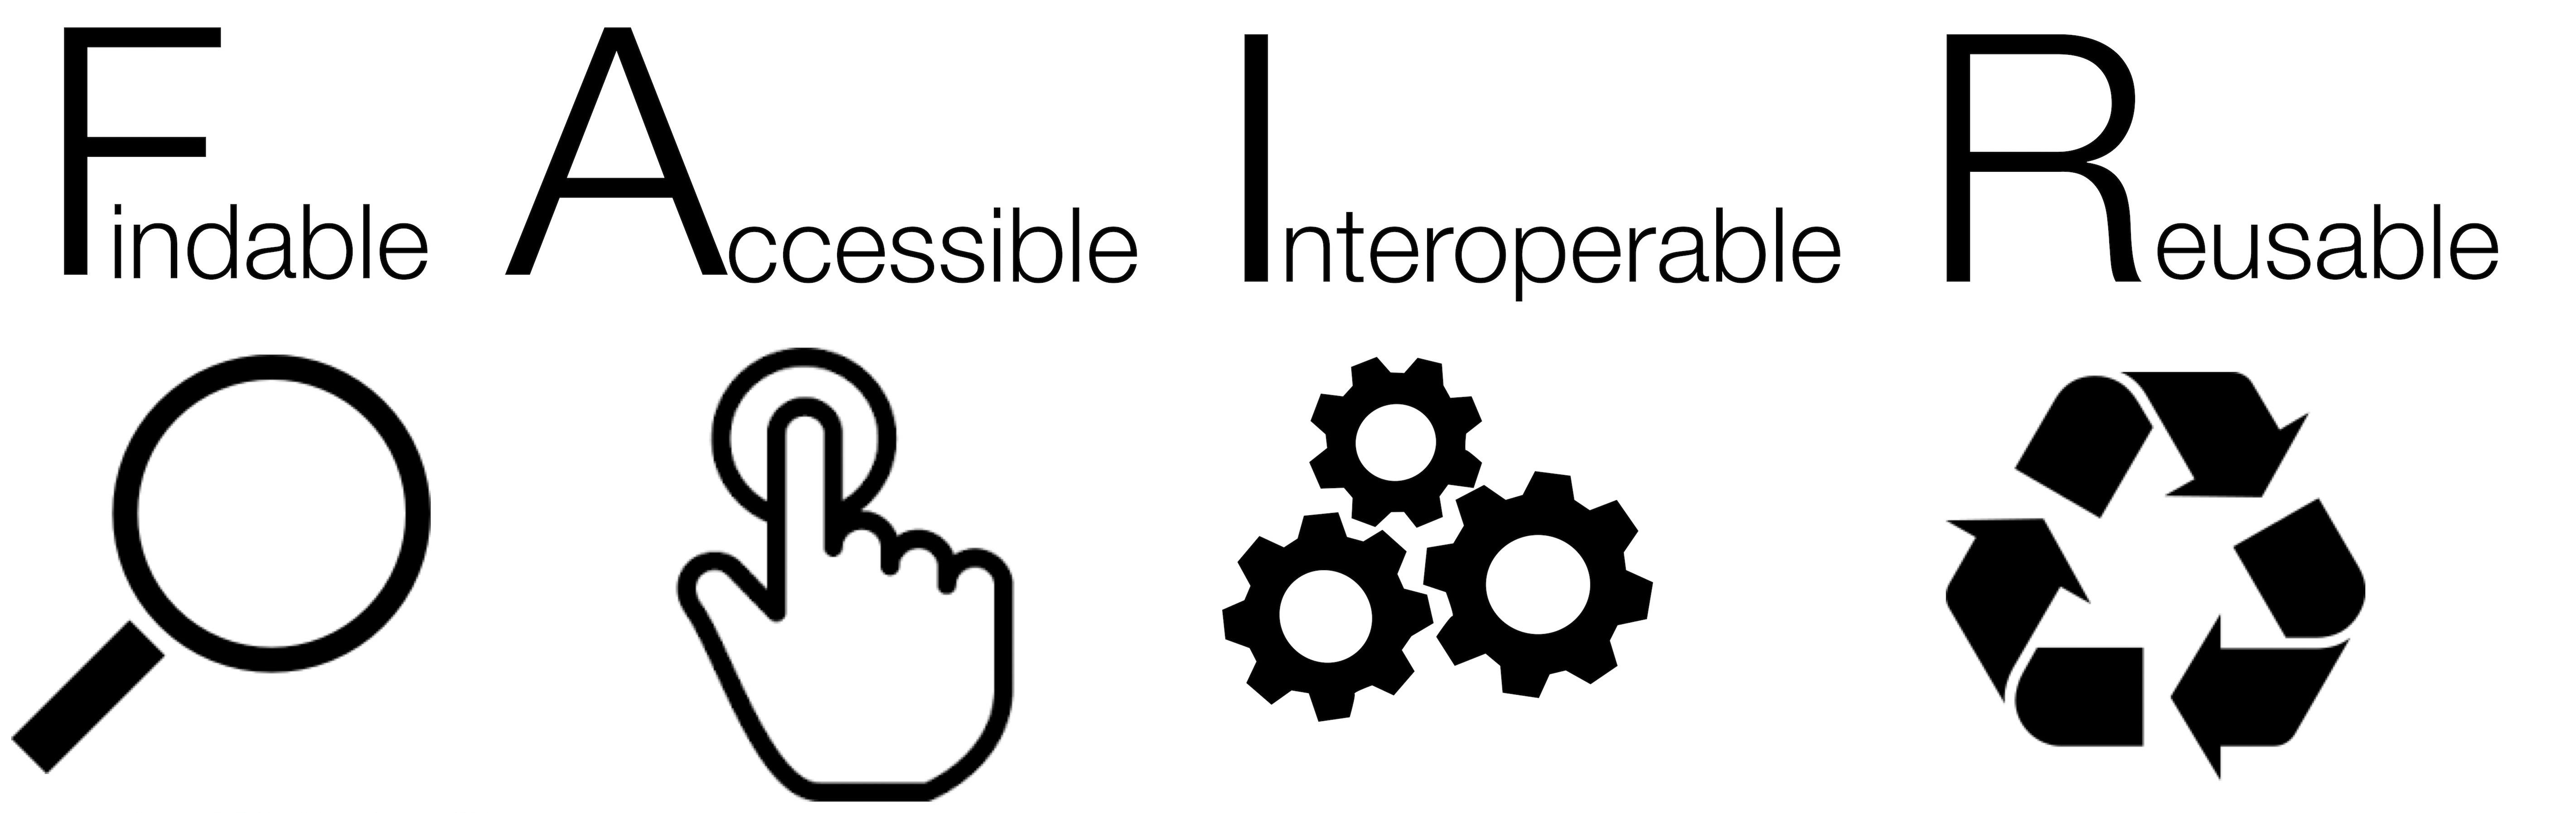 Webinar: How to make software FAIR